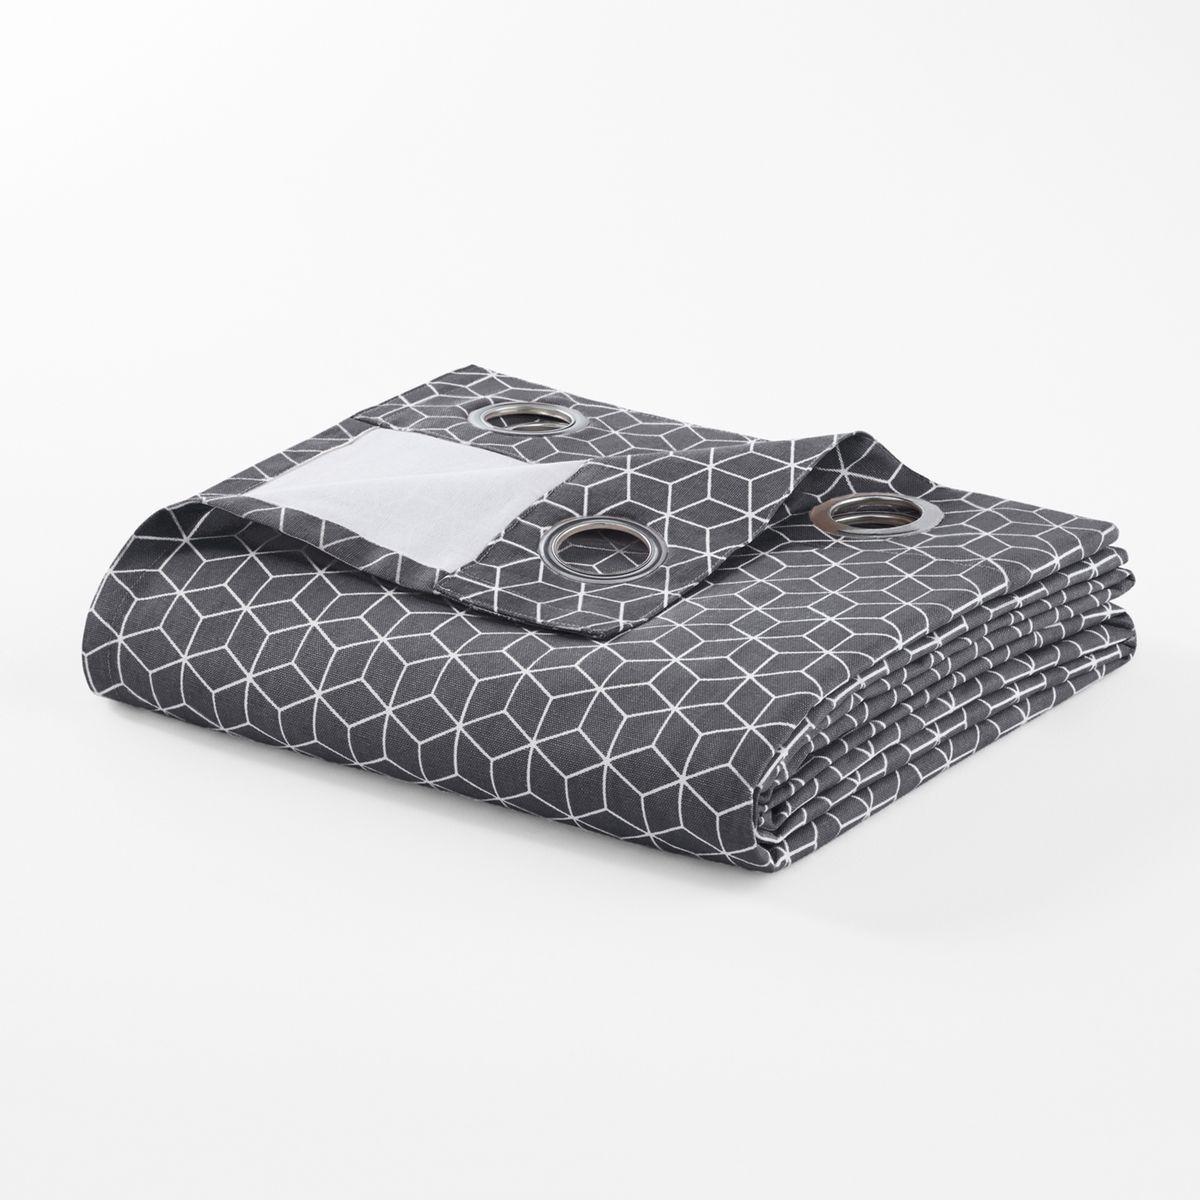 Rideau Imprime Decio Taille 350x140 Cm In 2019 Products Rideaux Imprimes Rideaux Imprime